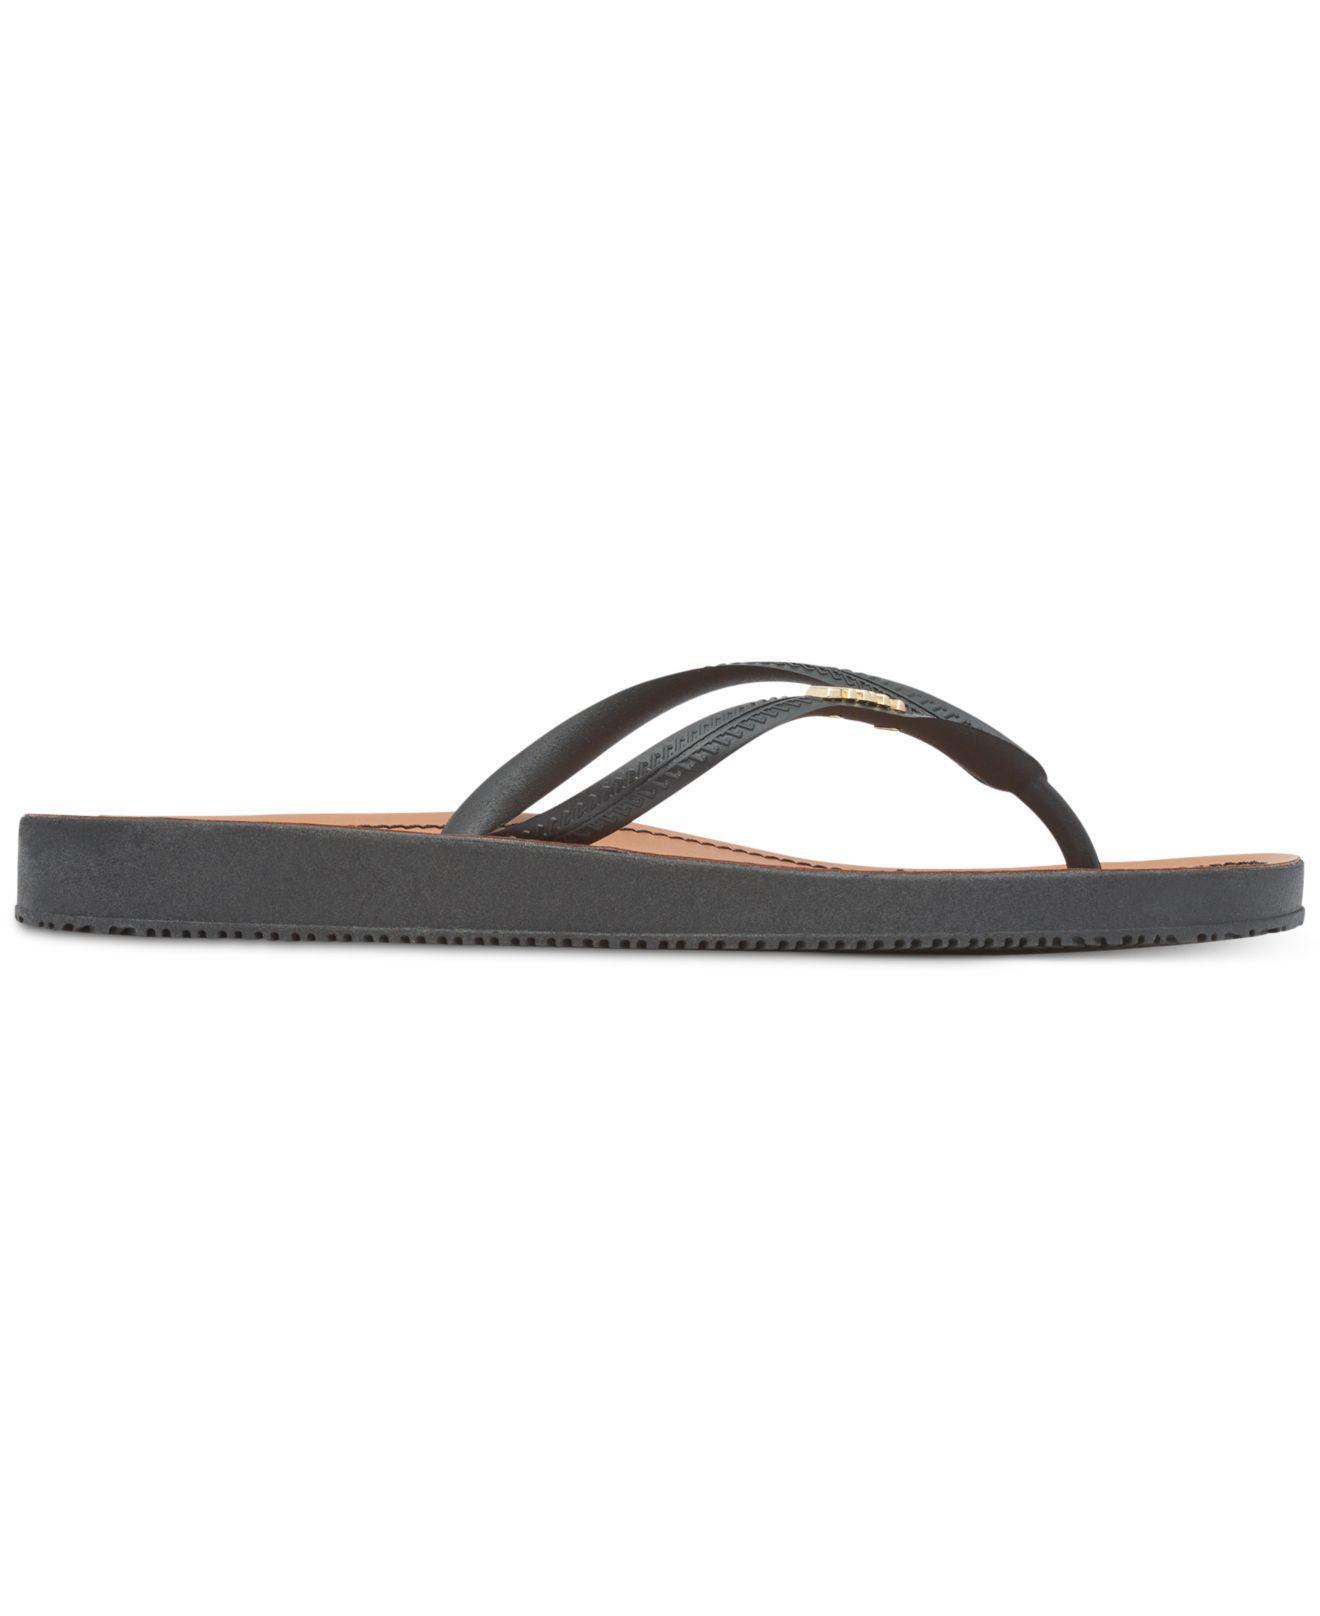 6ab1114d1b8 Lyst - DKNY Madi Flip-flops in Black